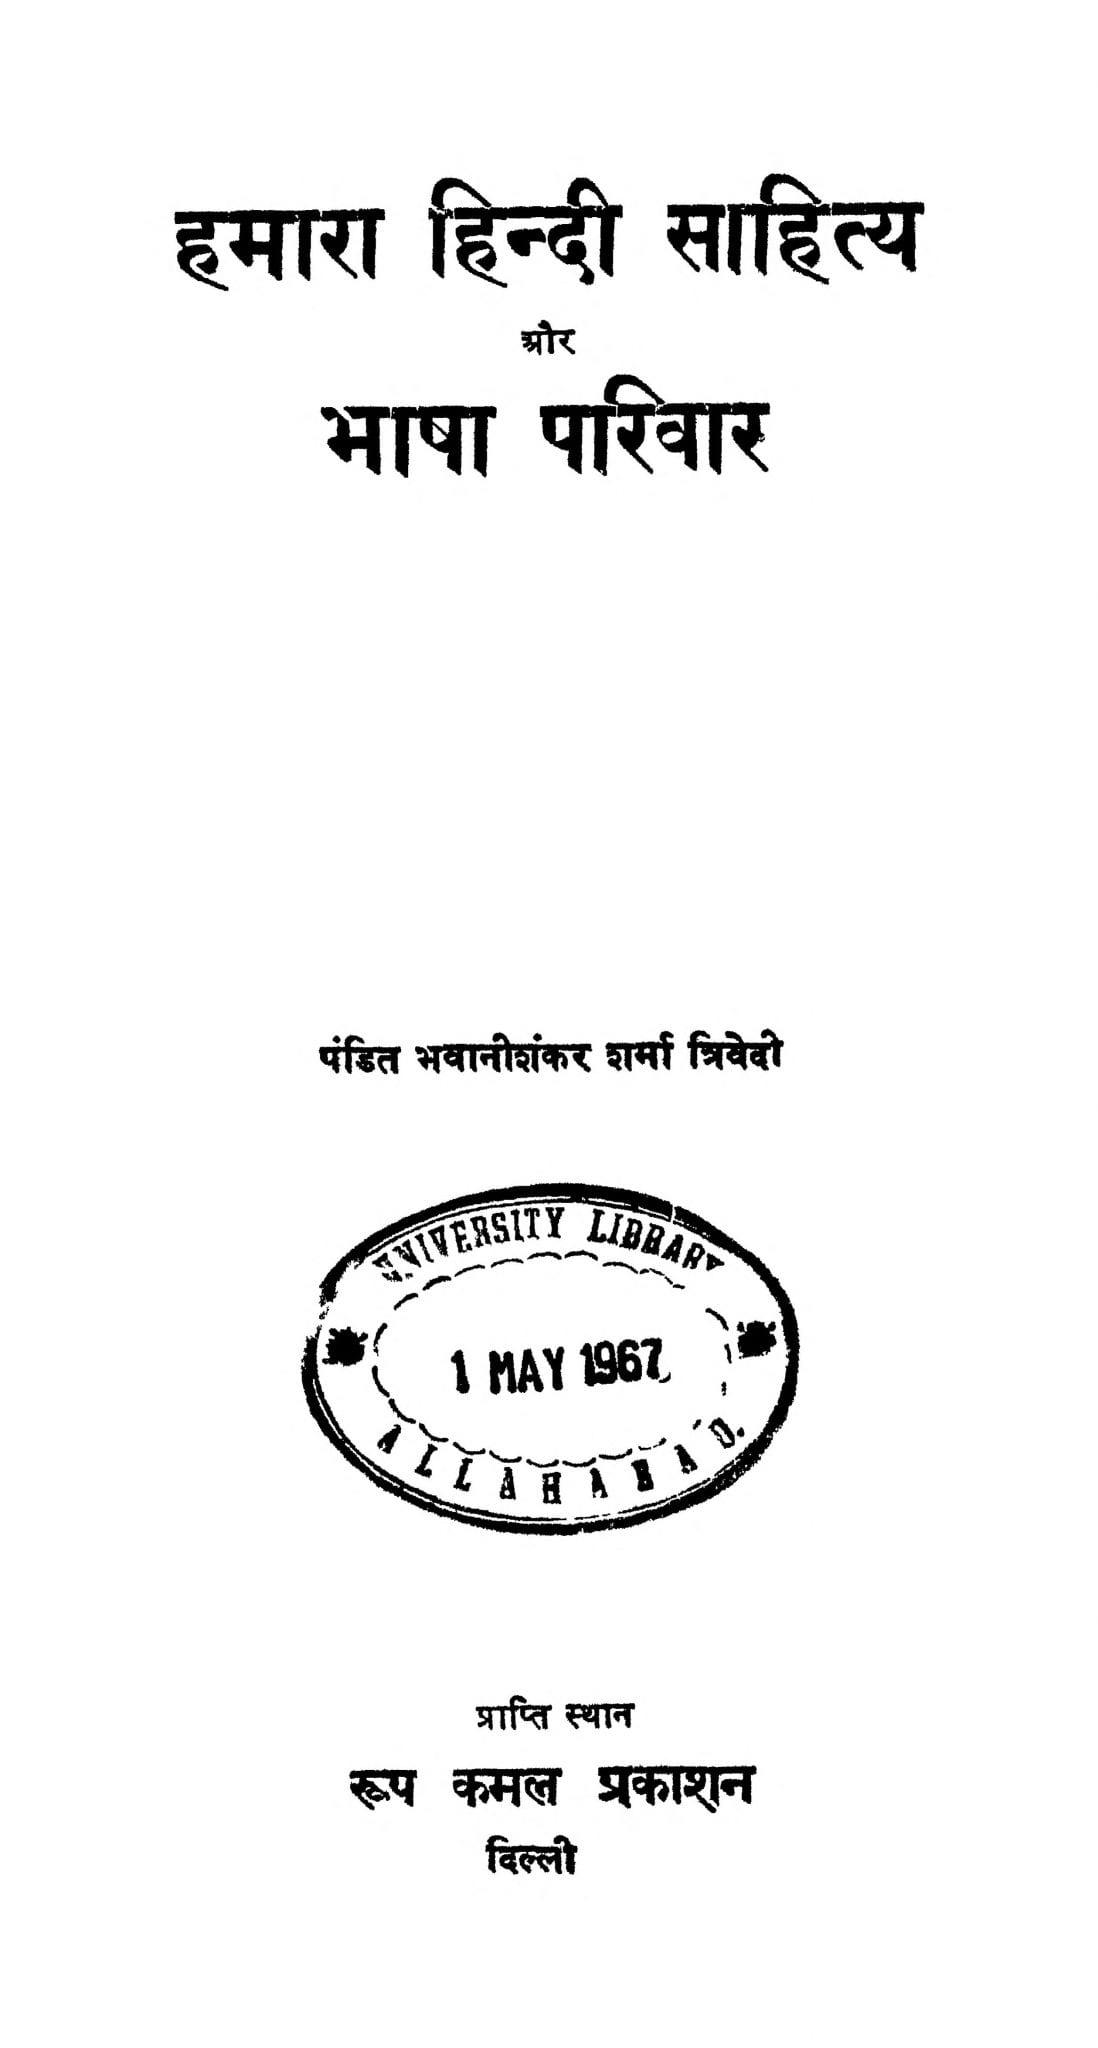 Book Image : हमारा हिंदी साहित्य और भाषा परिवार  - Hamara Hindi Sahitya Aur Bhasha Pariwar